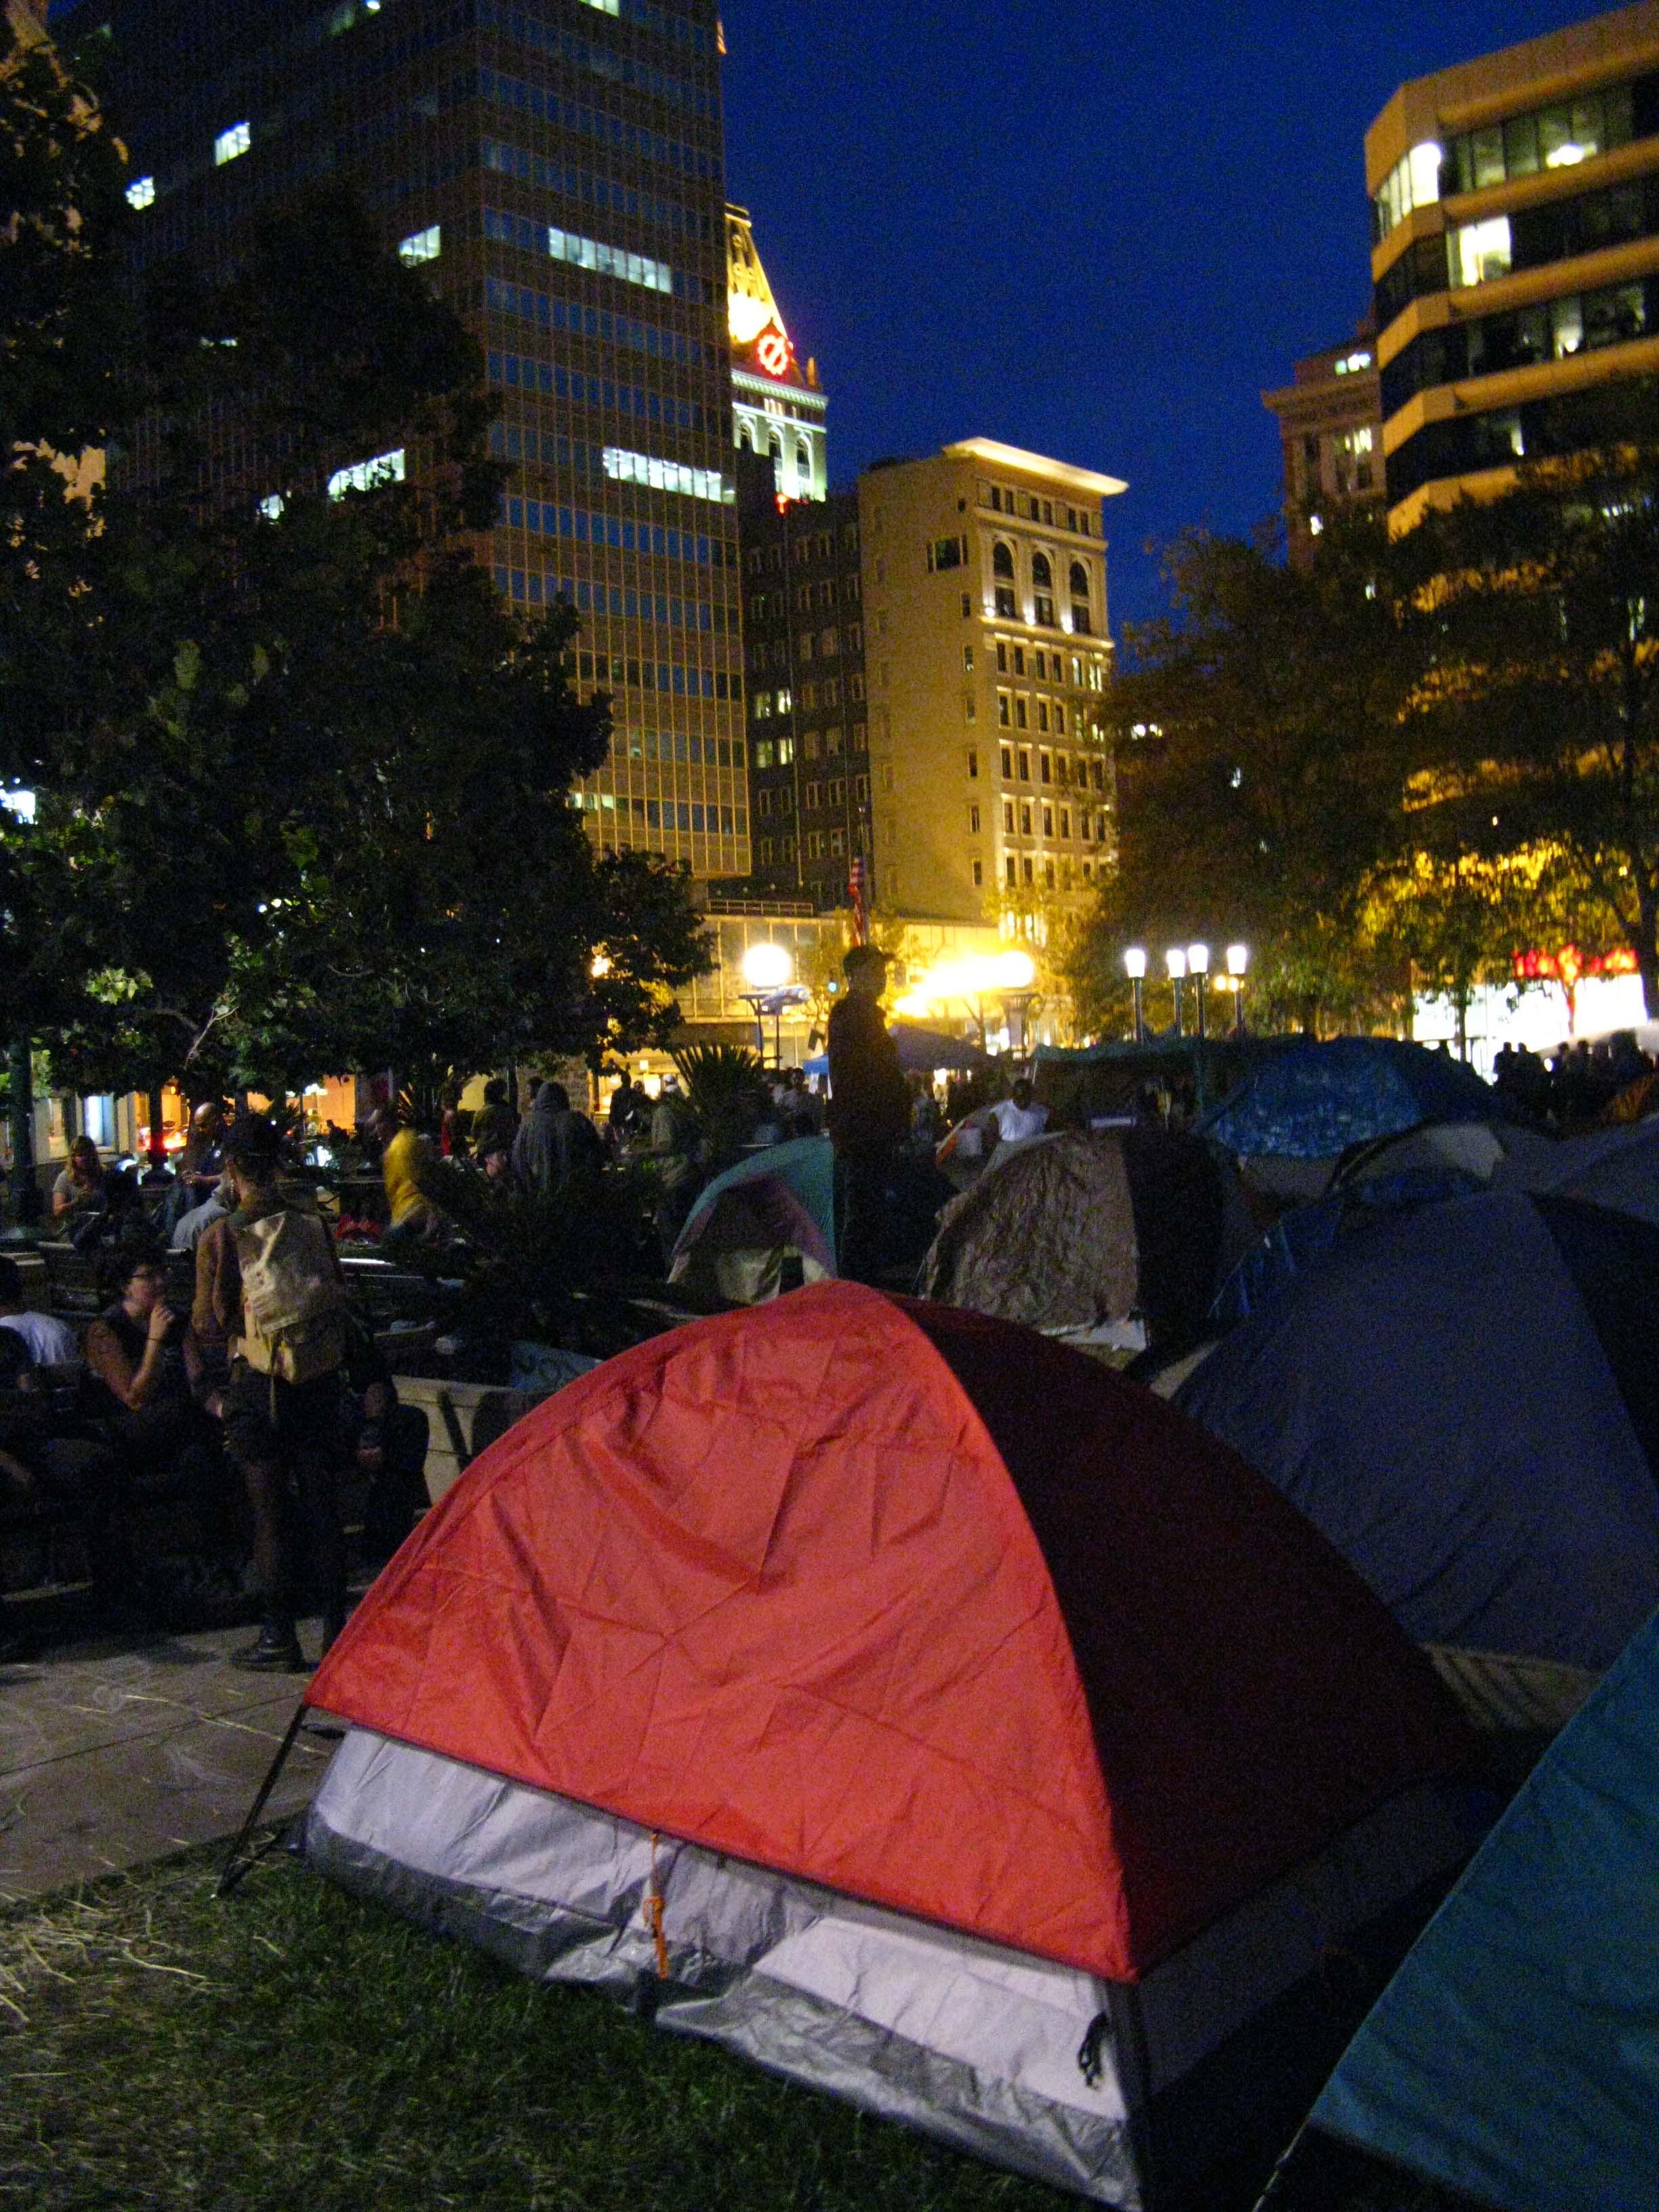 occupy oakland by night.jpg